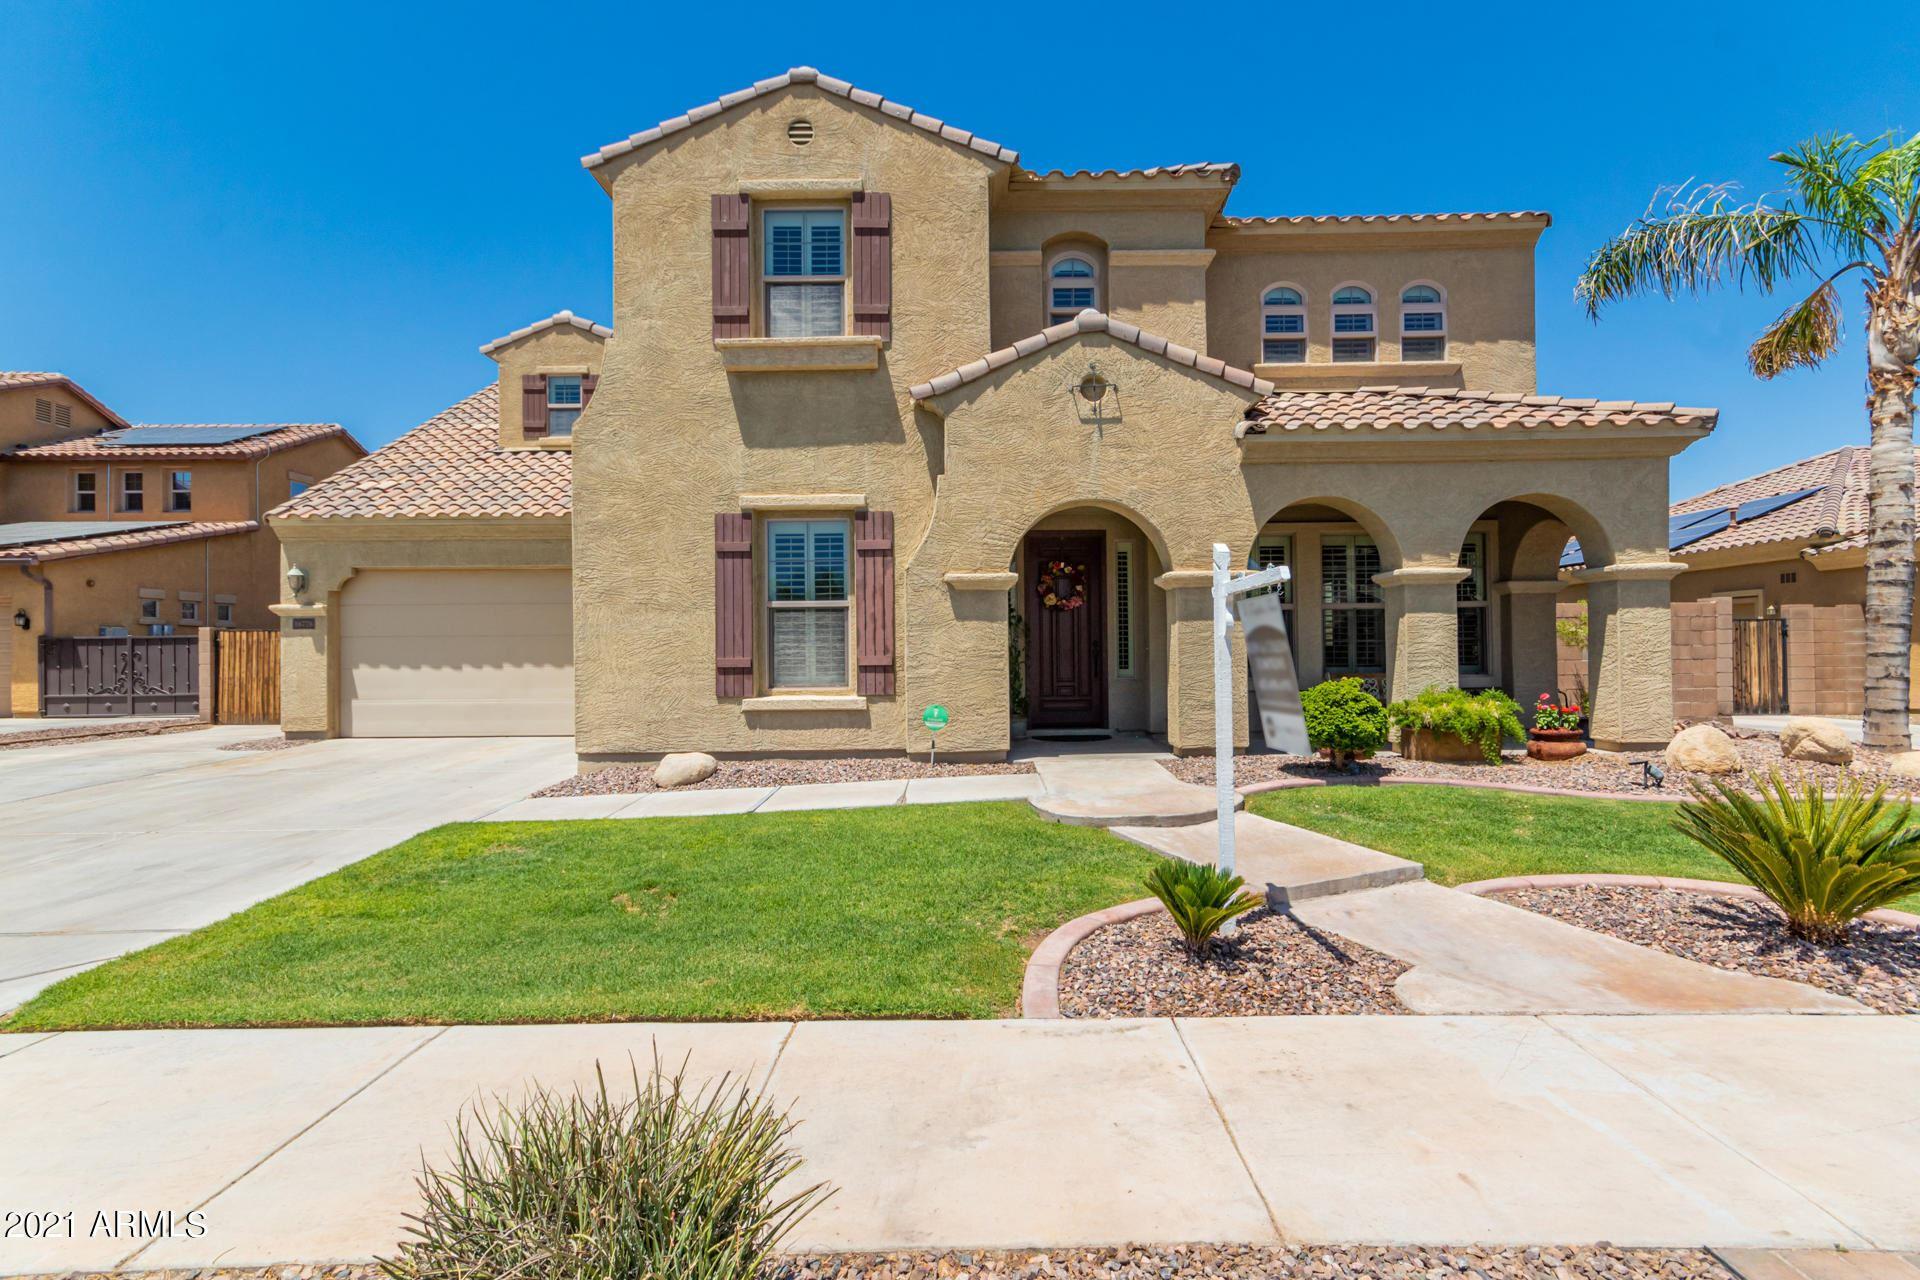 16778 W JACKSON Street, Goodyear, AZ 85338 - MLS#: 6237748